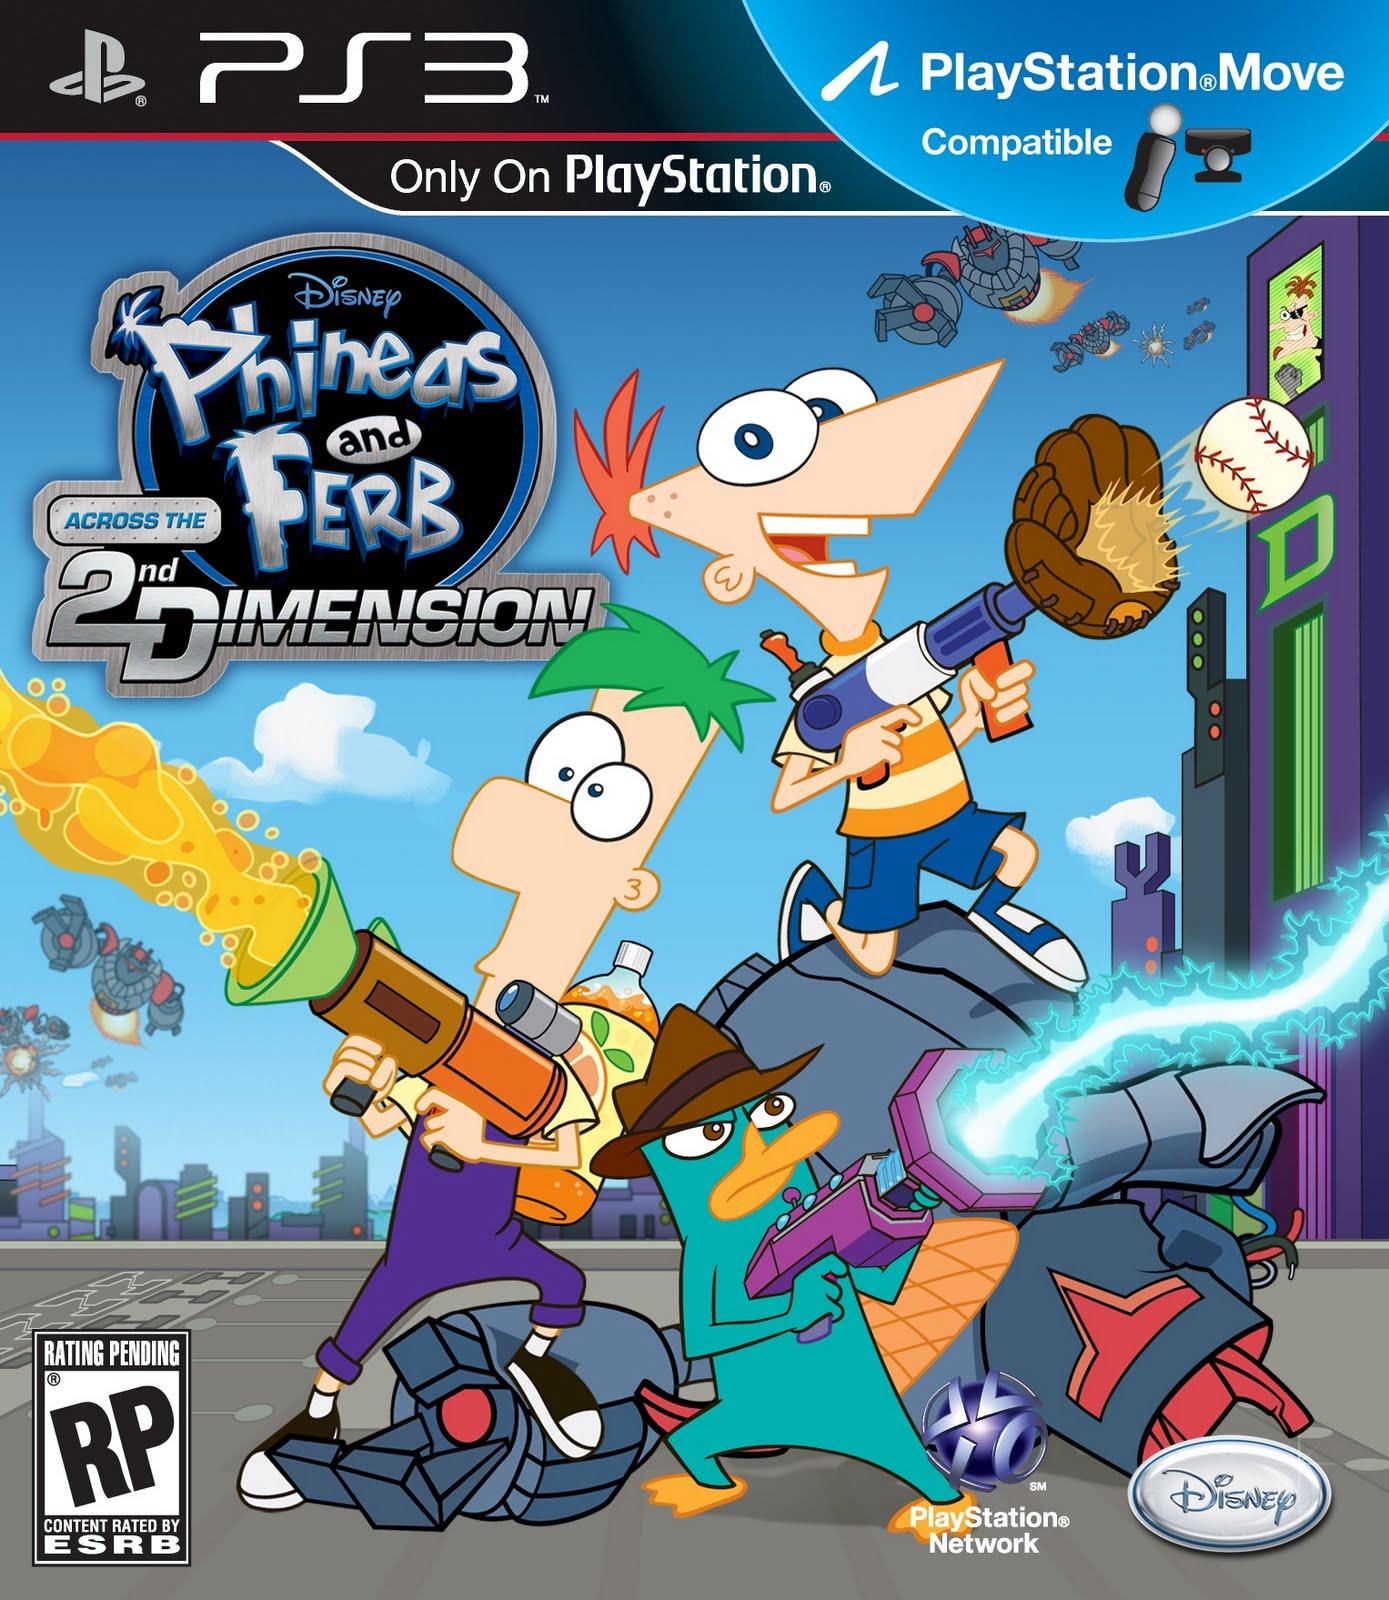 http://2.bp.blogspot.com/-tLroIo2A8oU/TZxqCdOq2LI/AAAAAAAACtg/R48KRFaW7yM/s1600/Phineas_and_Ferb_Across_the_Second_Dimension_PS3.jpg